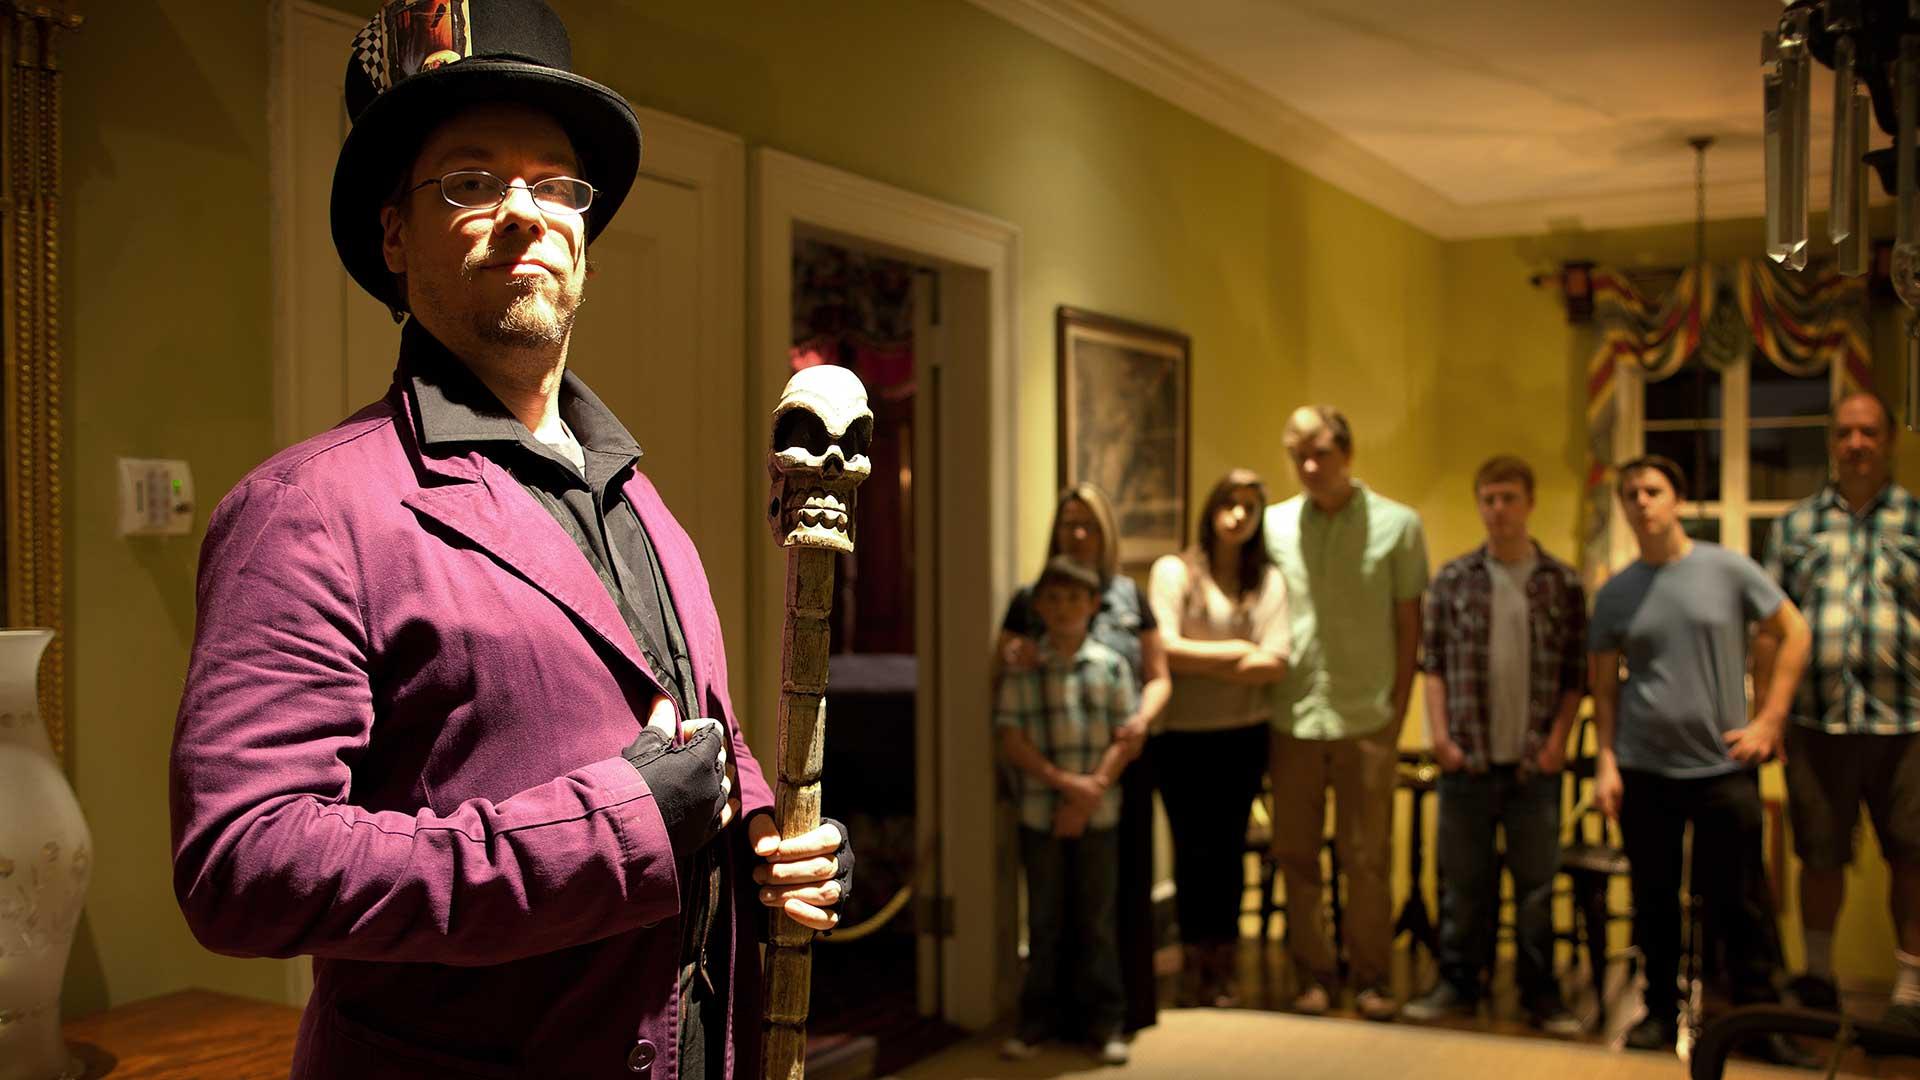 savannah andrew low haunted house butler